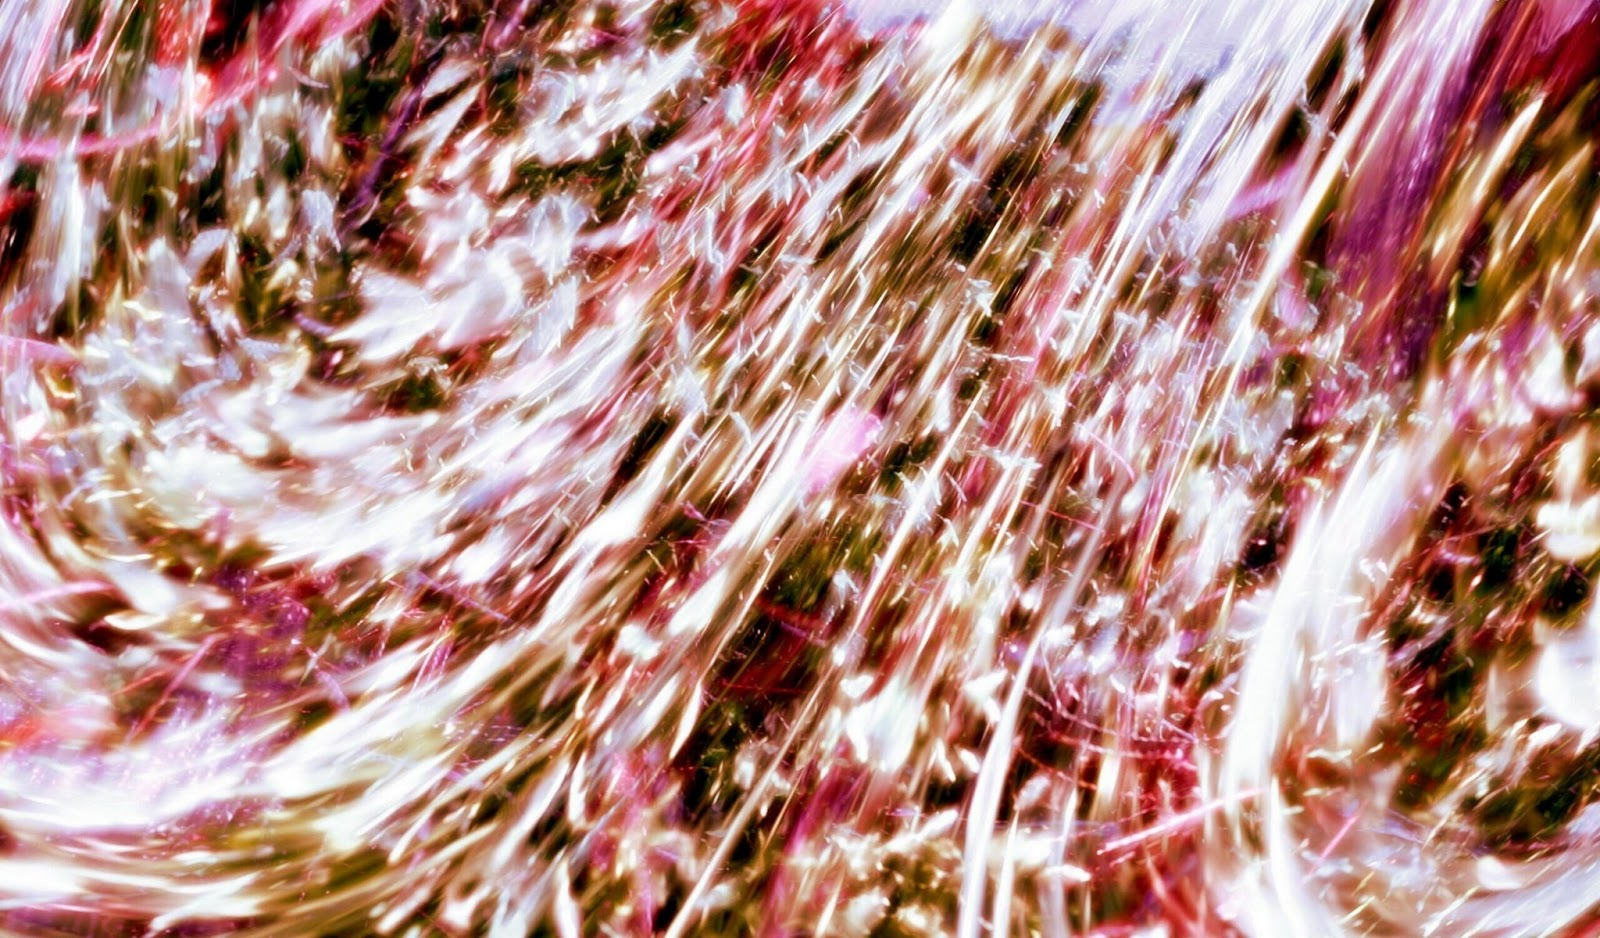 http://2.bp.blogspot.com/-2QwZZpVm8Jc/UWxa-gh3esI/AAAAAAAAFQ0/-IJNWL3q3fo/s1600/abstract-wallpaper-background-in-gold-white-and-red.jpg